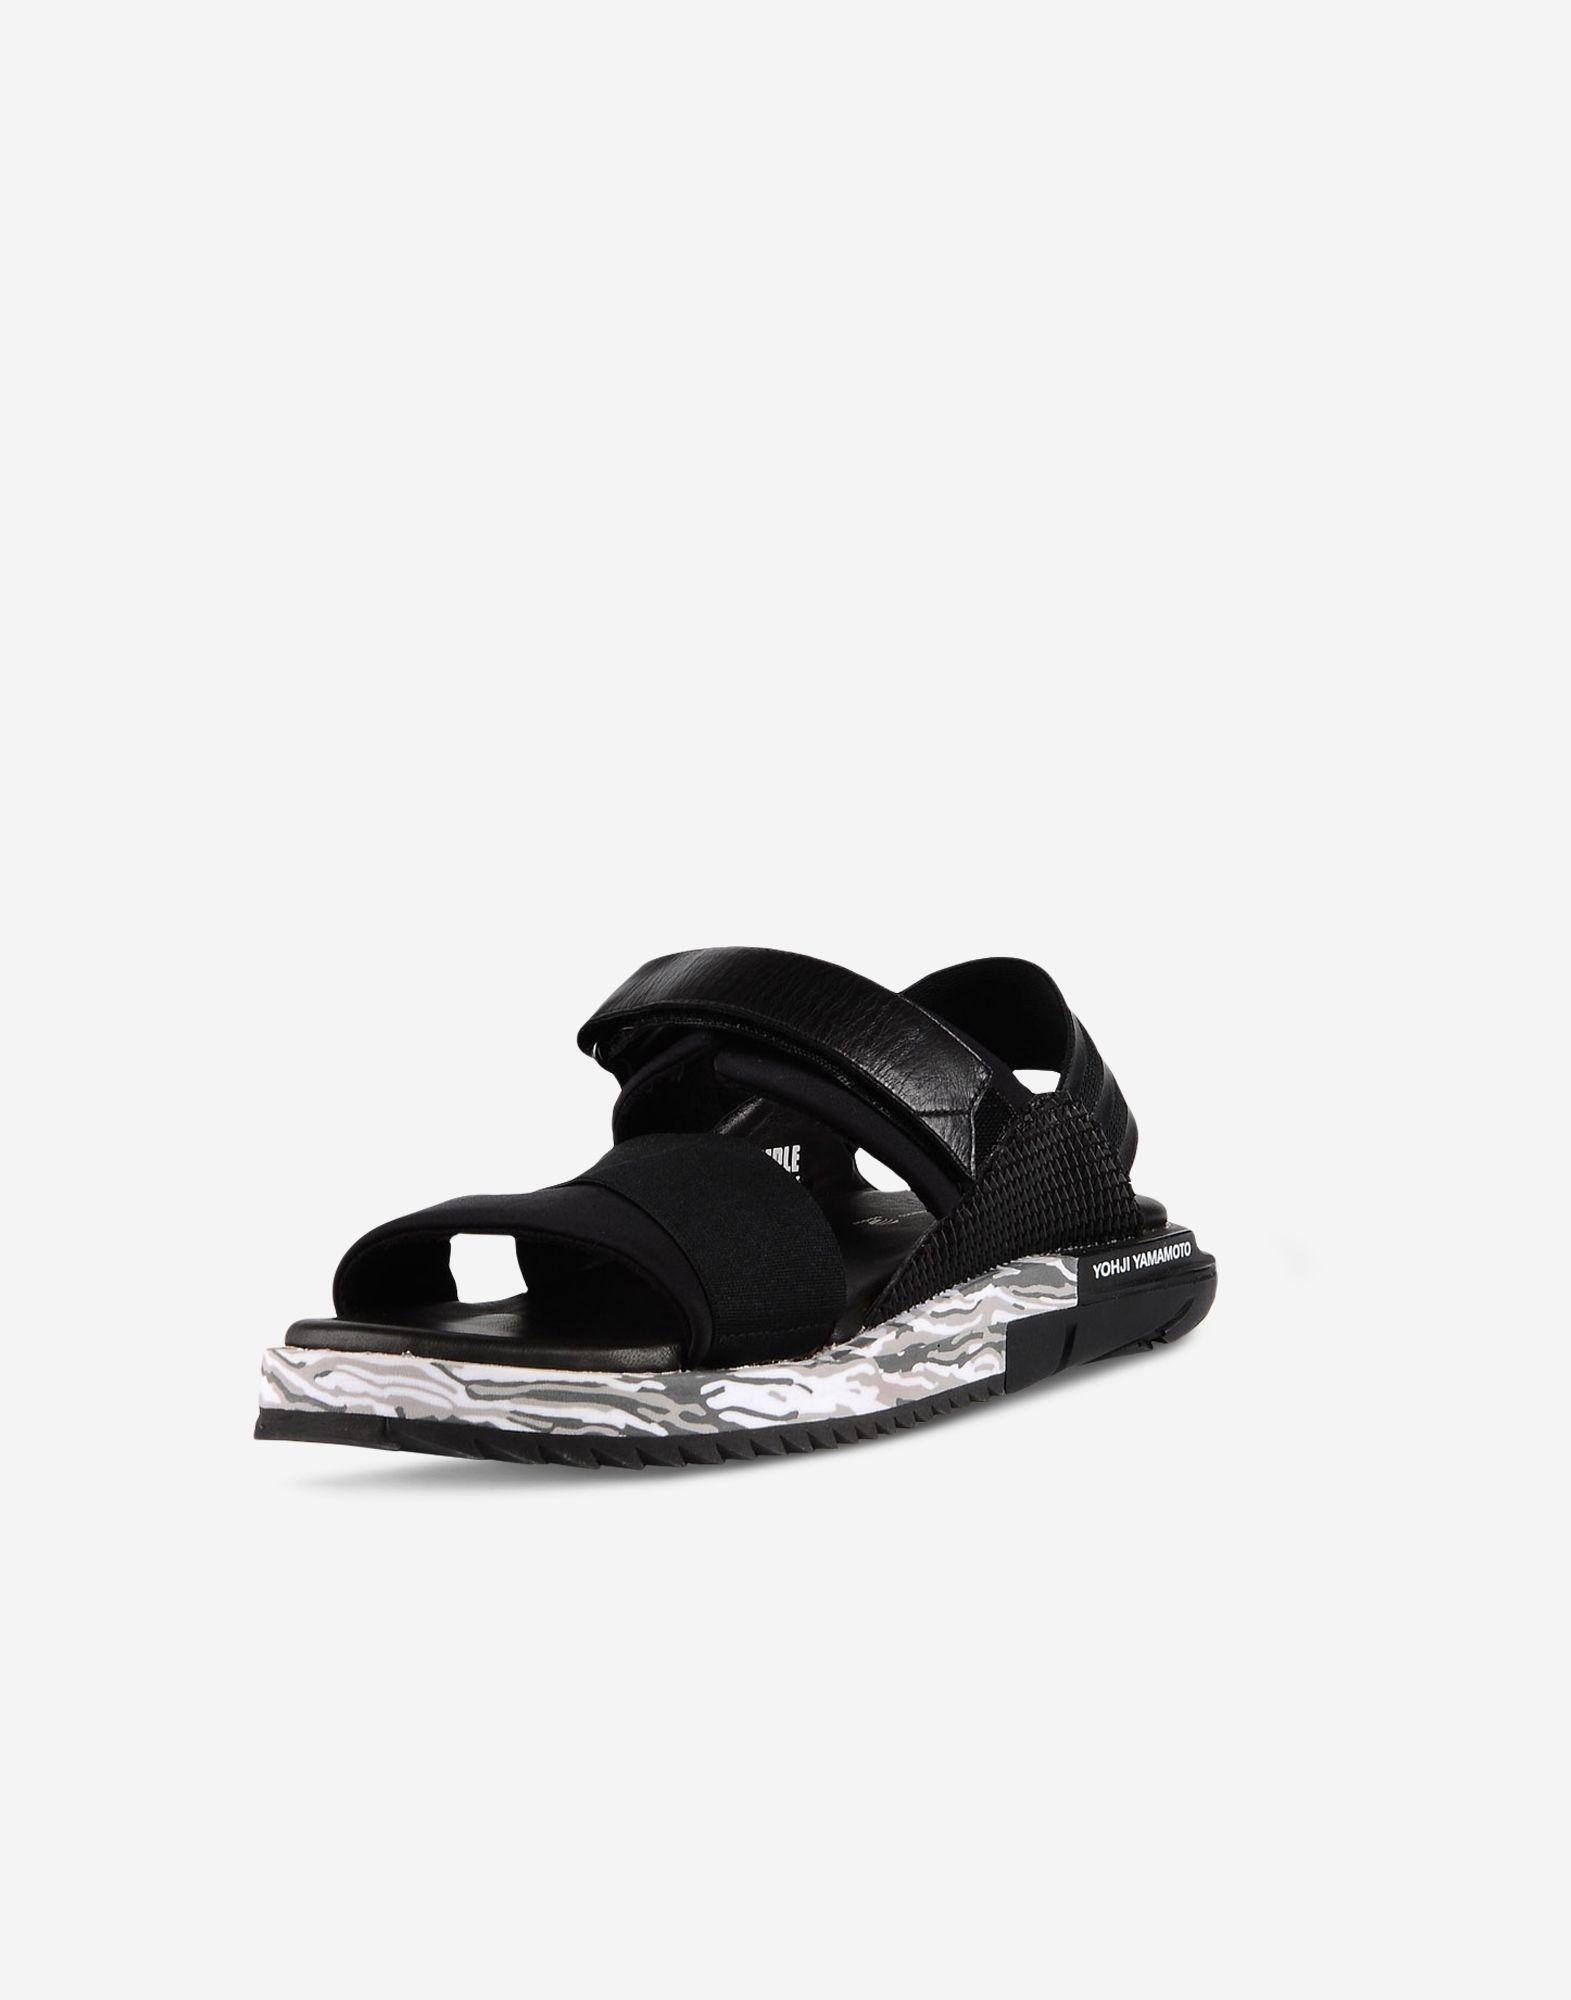 ... Y-3 Kaohe Sandal SHOES man Y-3 adidas ...